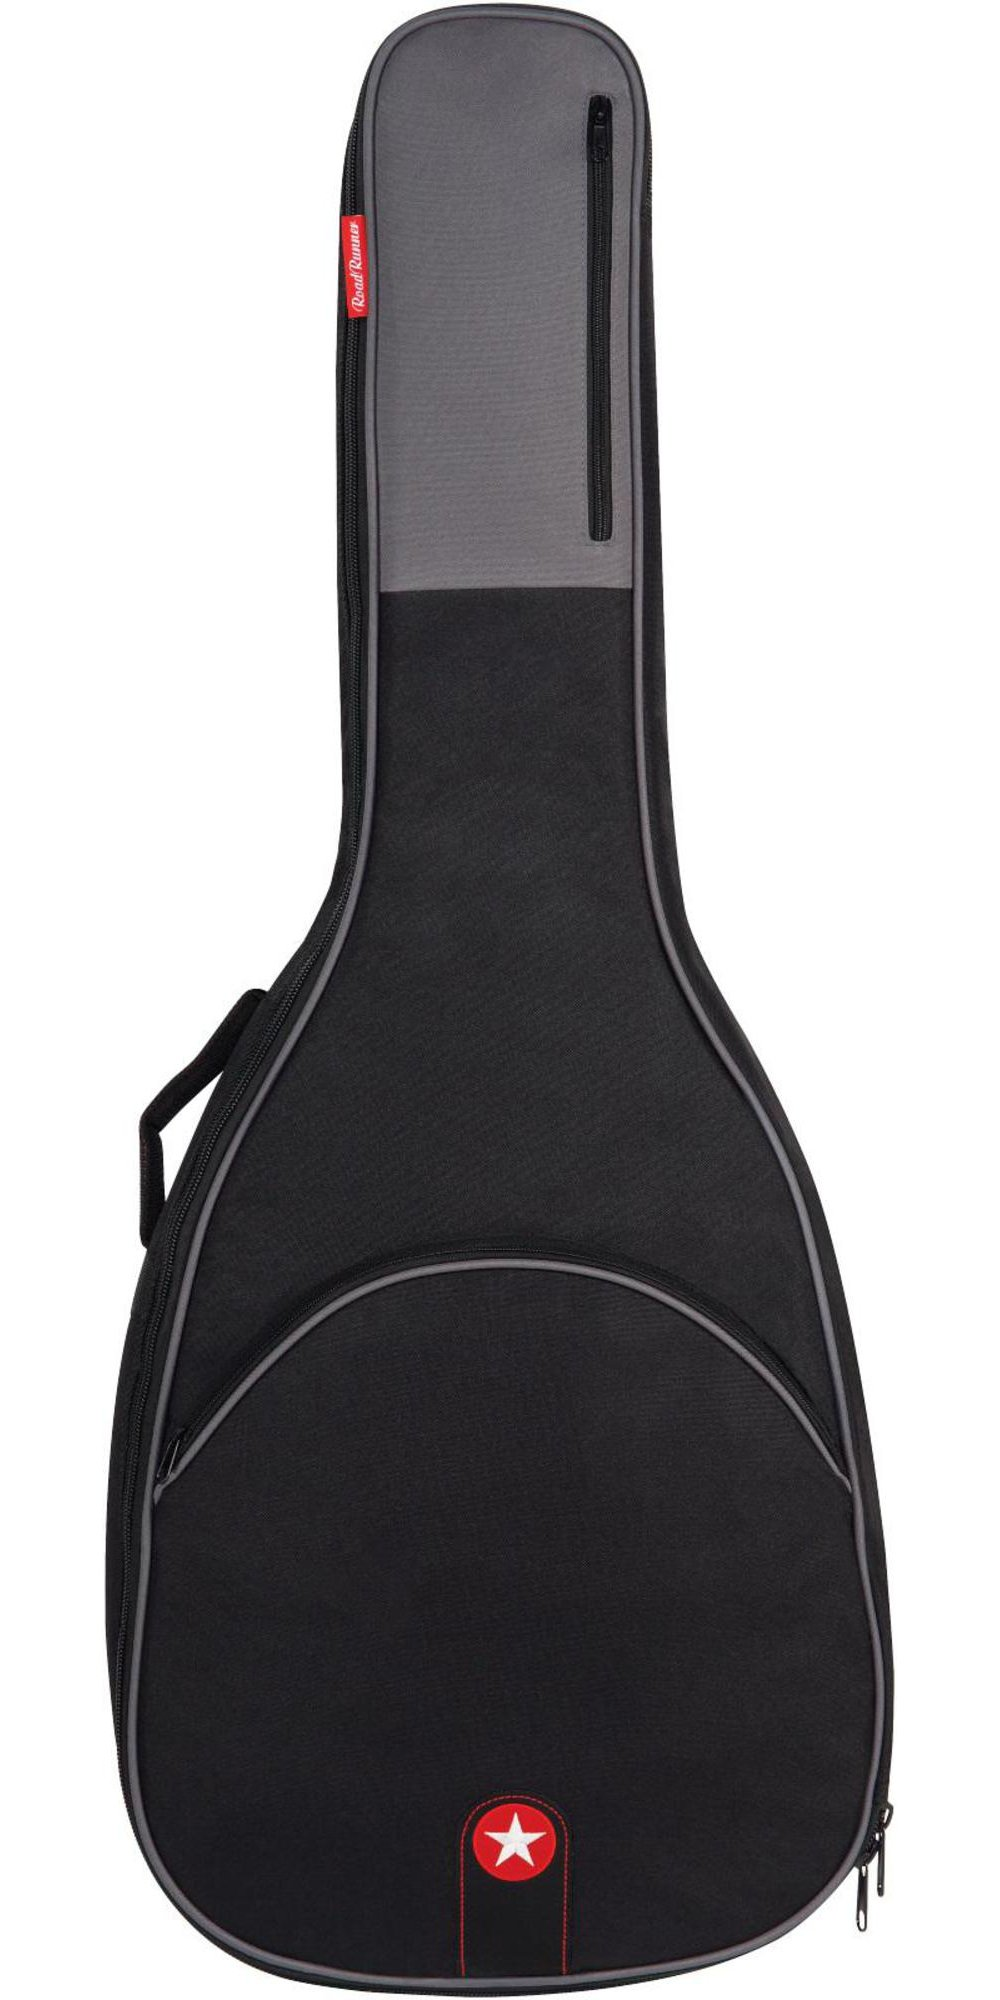 Road Runner RR1AG Avenue Series Acoustic Guitar Gig Bag